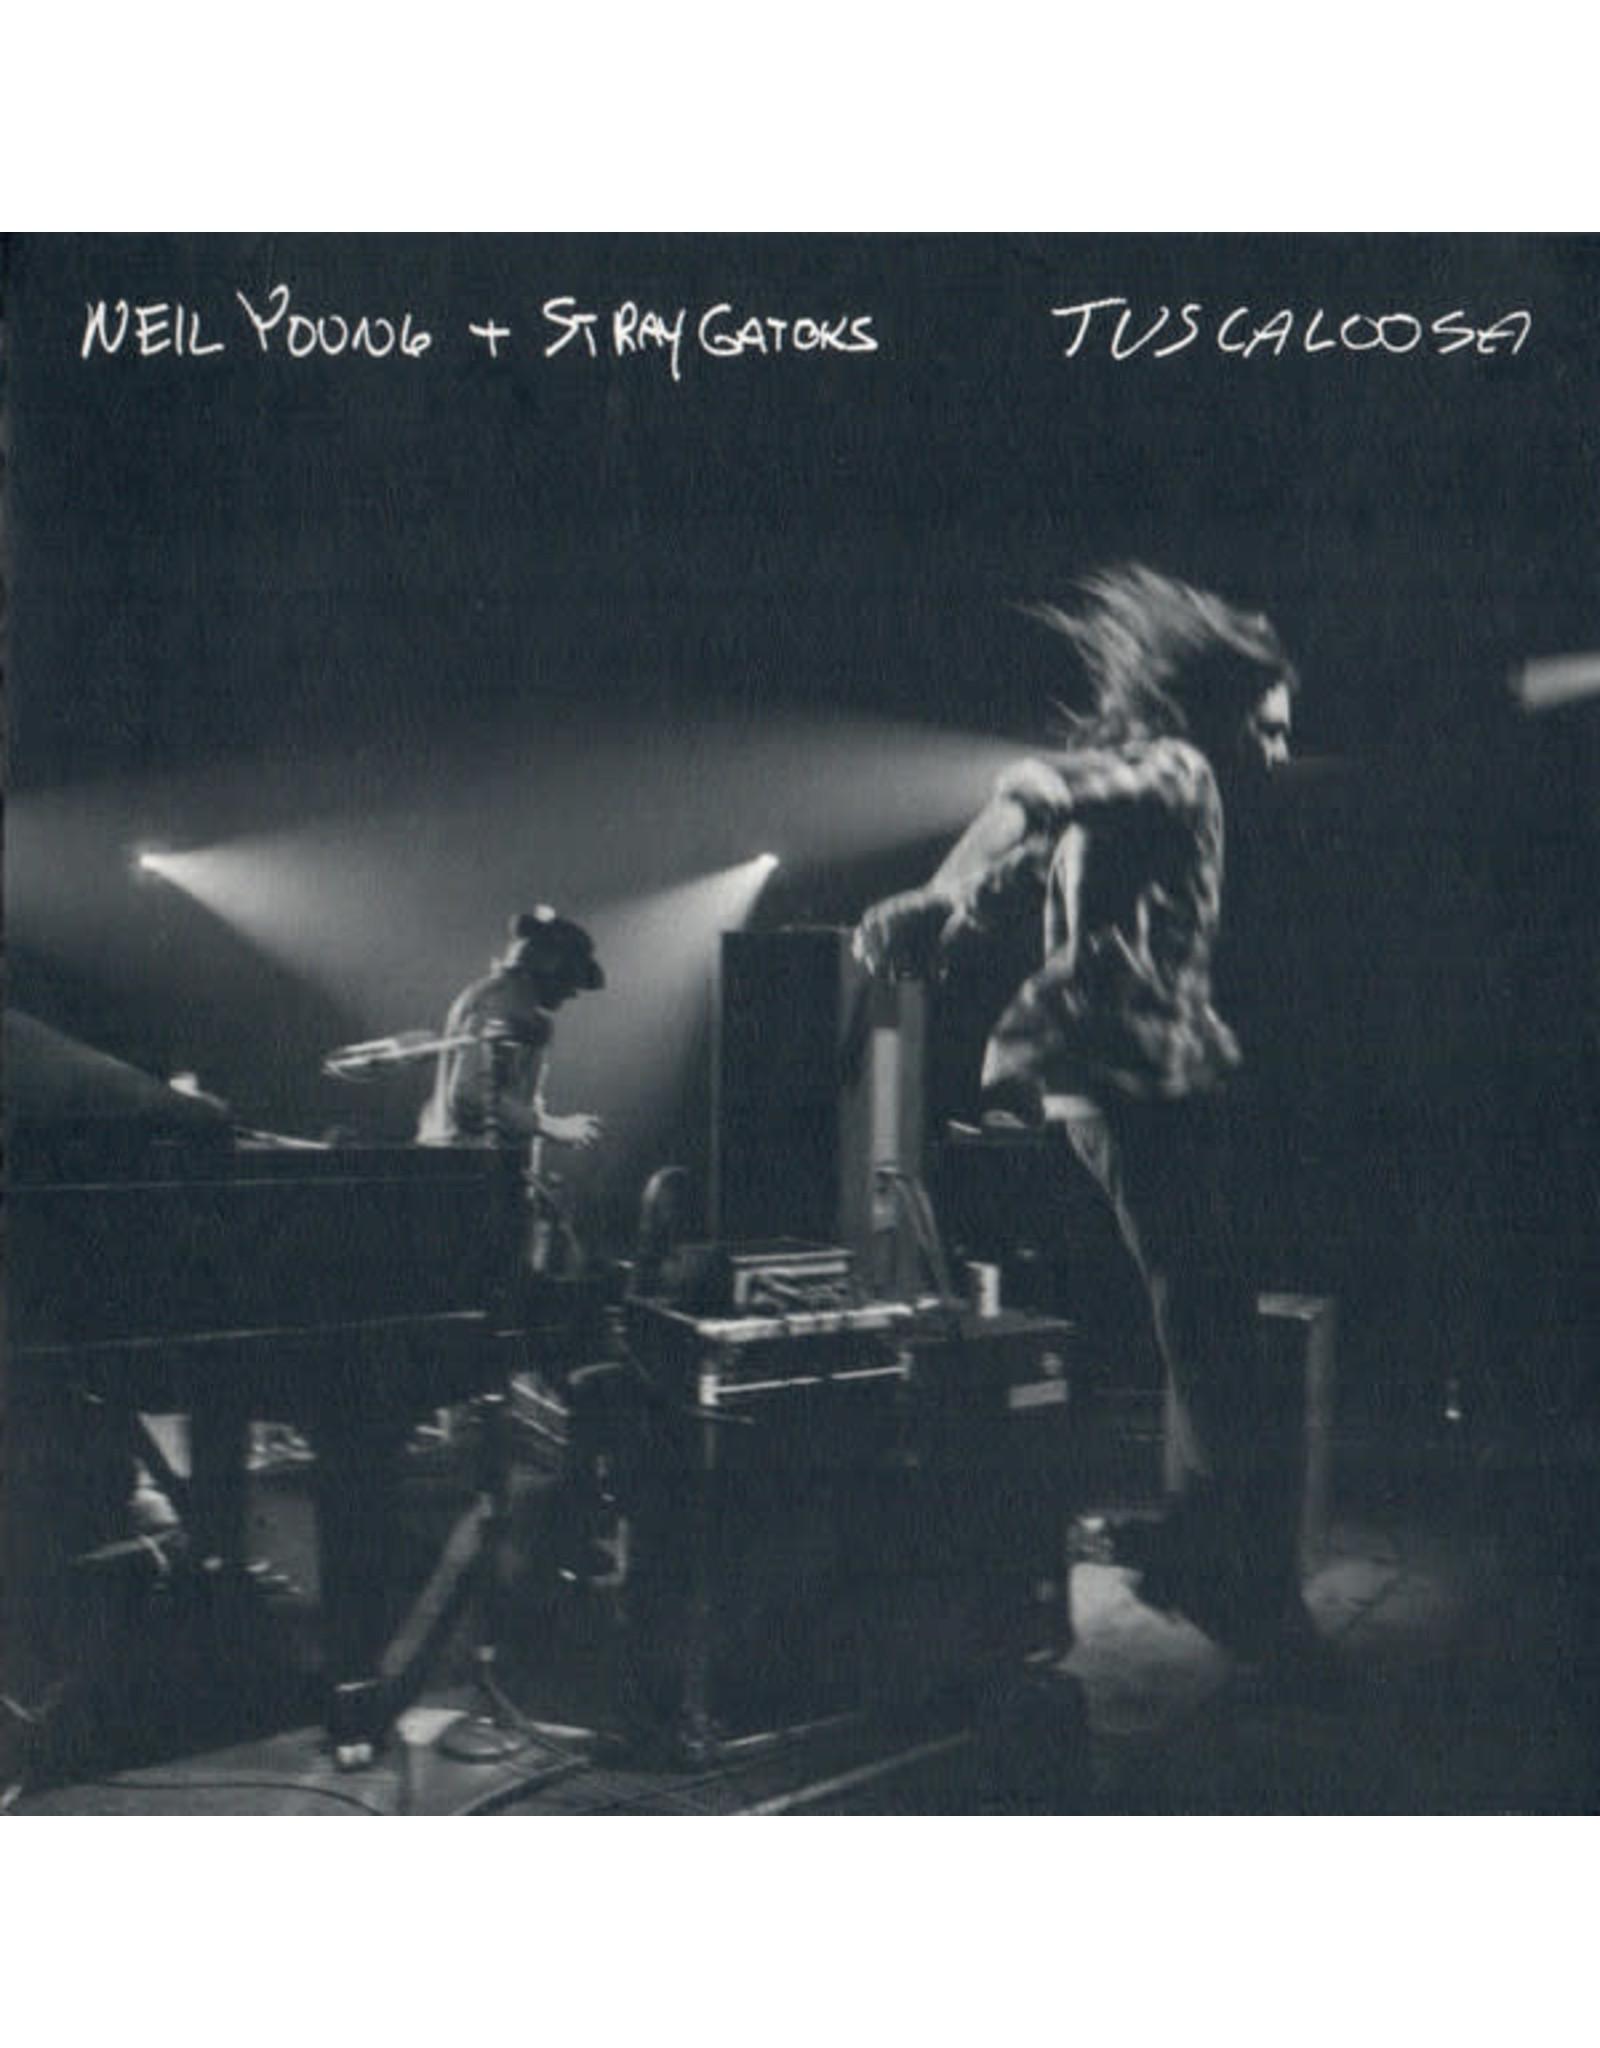 Young, Neil & The Stray Gators - Tuscaloosa CD